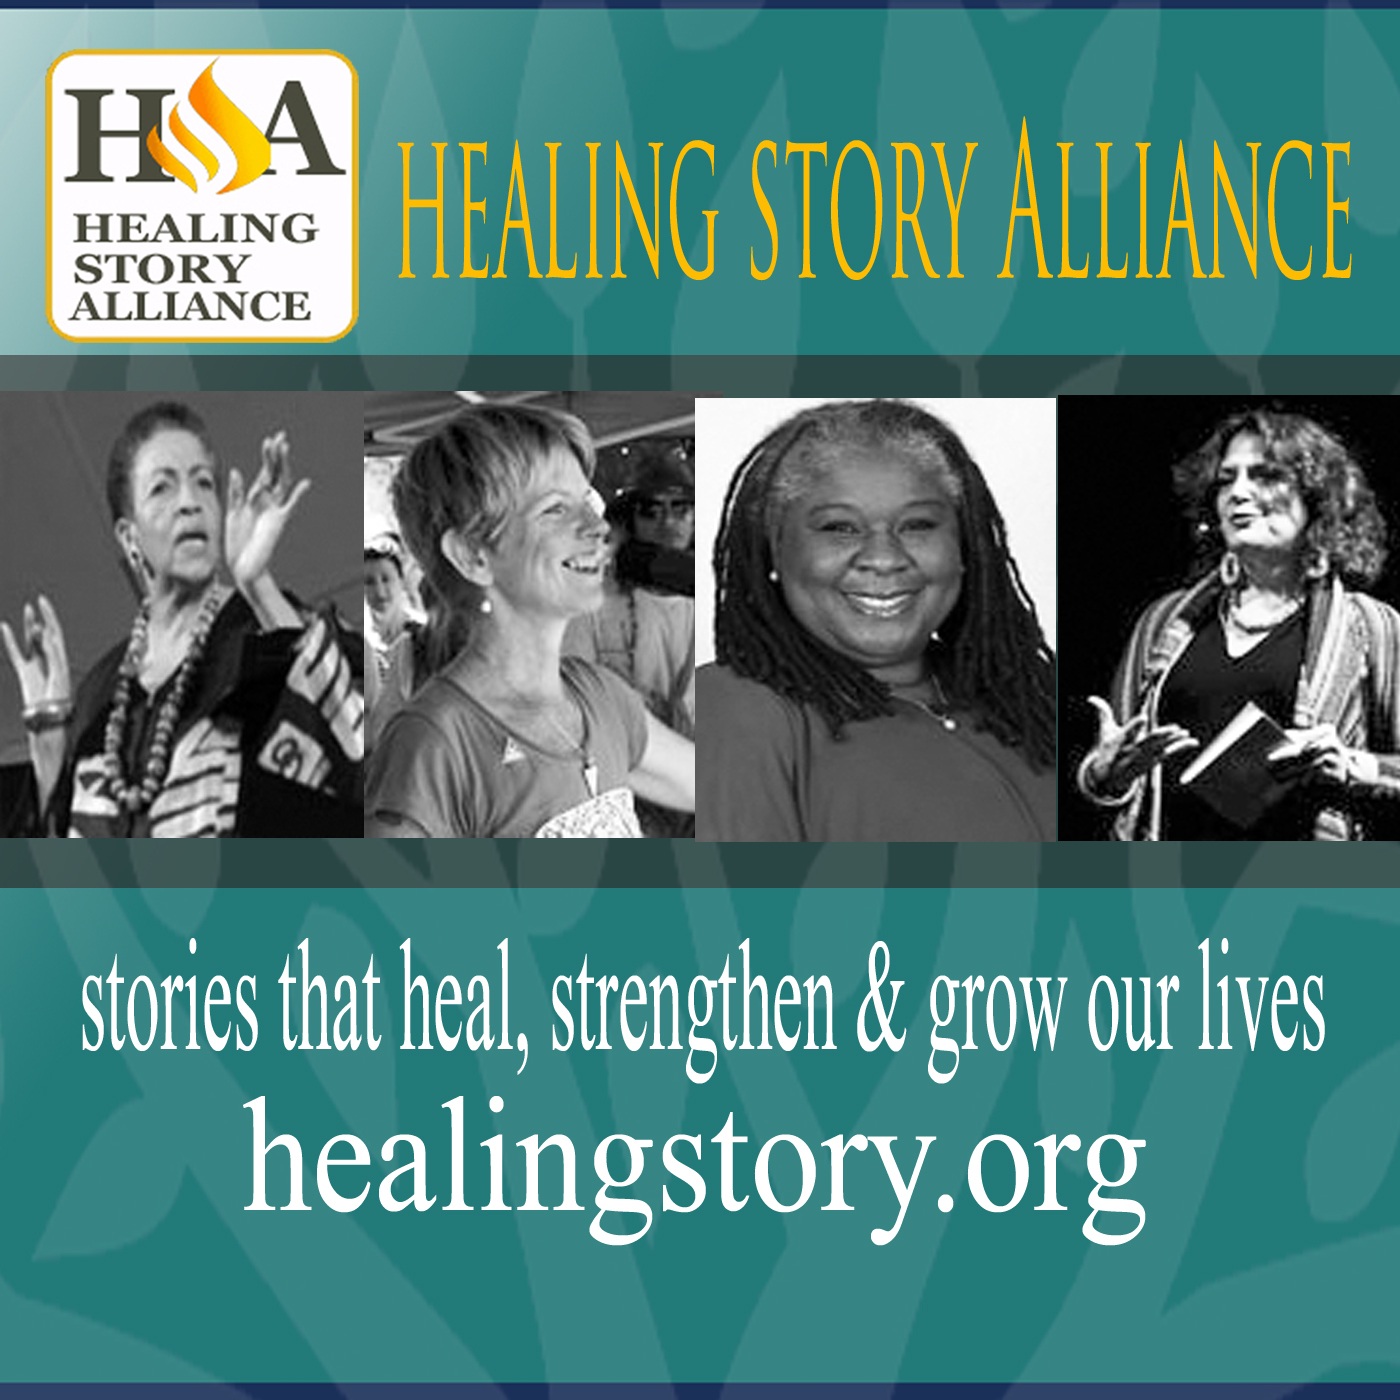 Healing Story Alliance